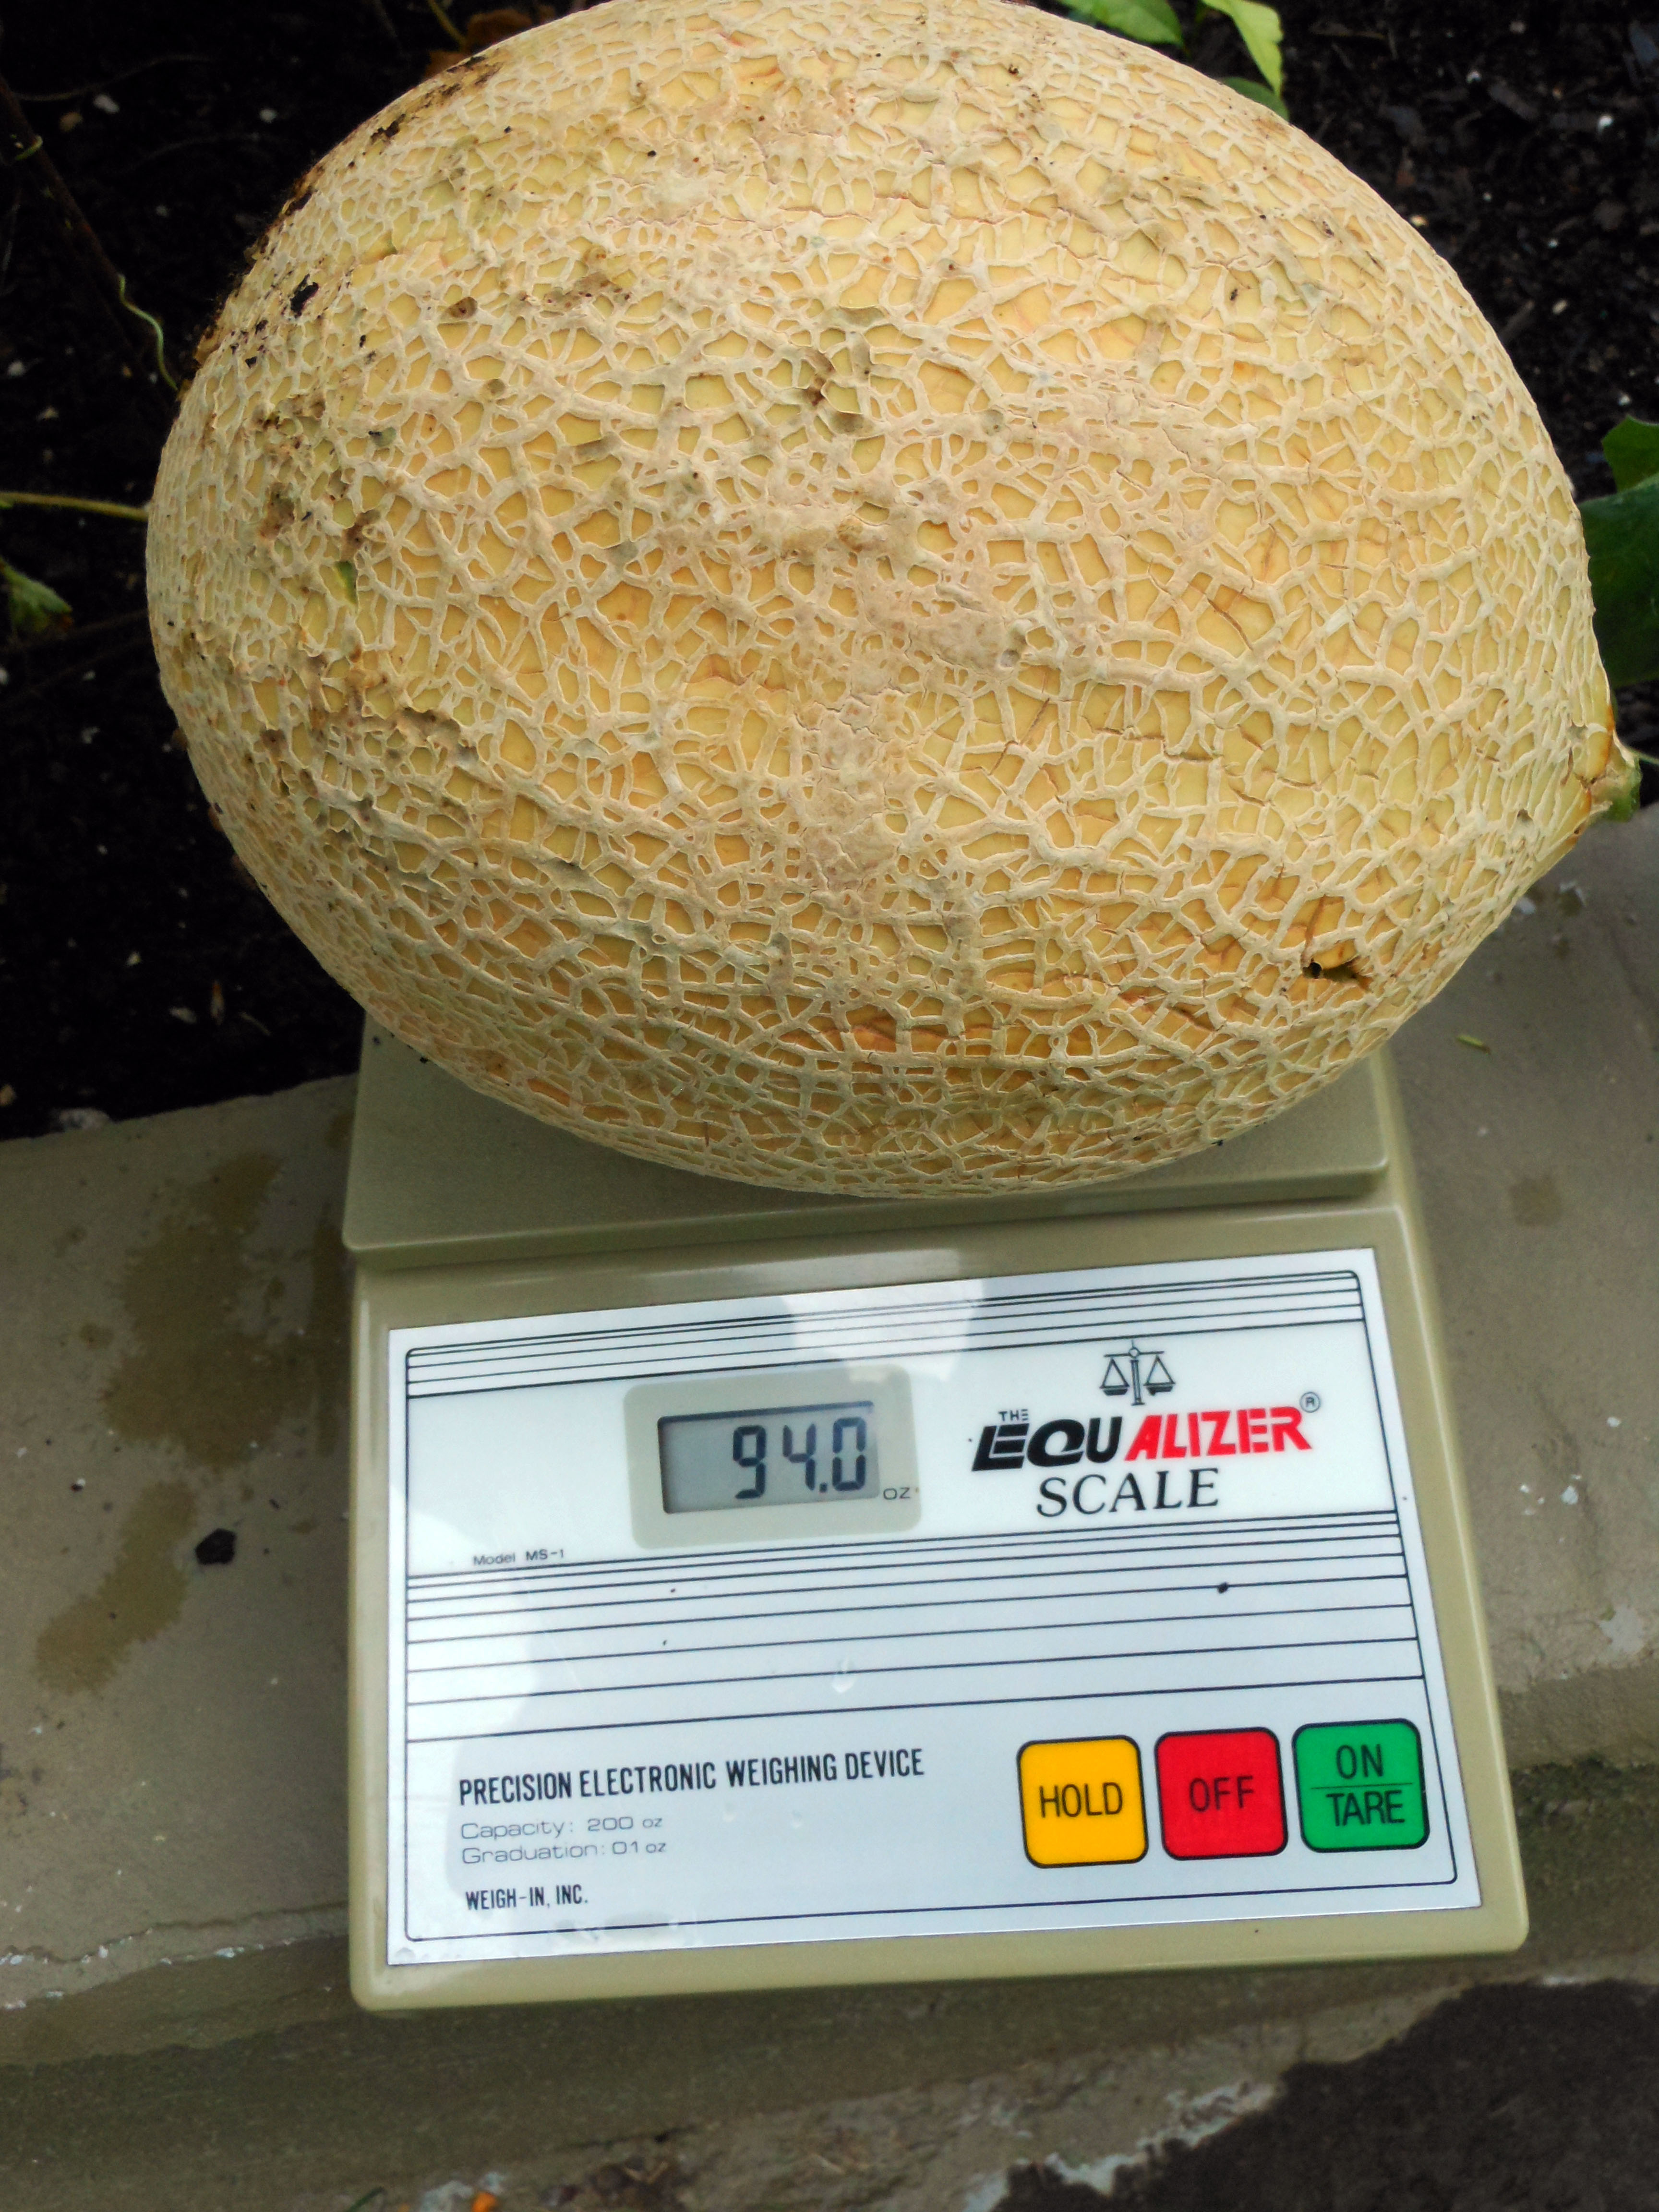 08-18-2016-cantaloupe-plant-11